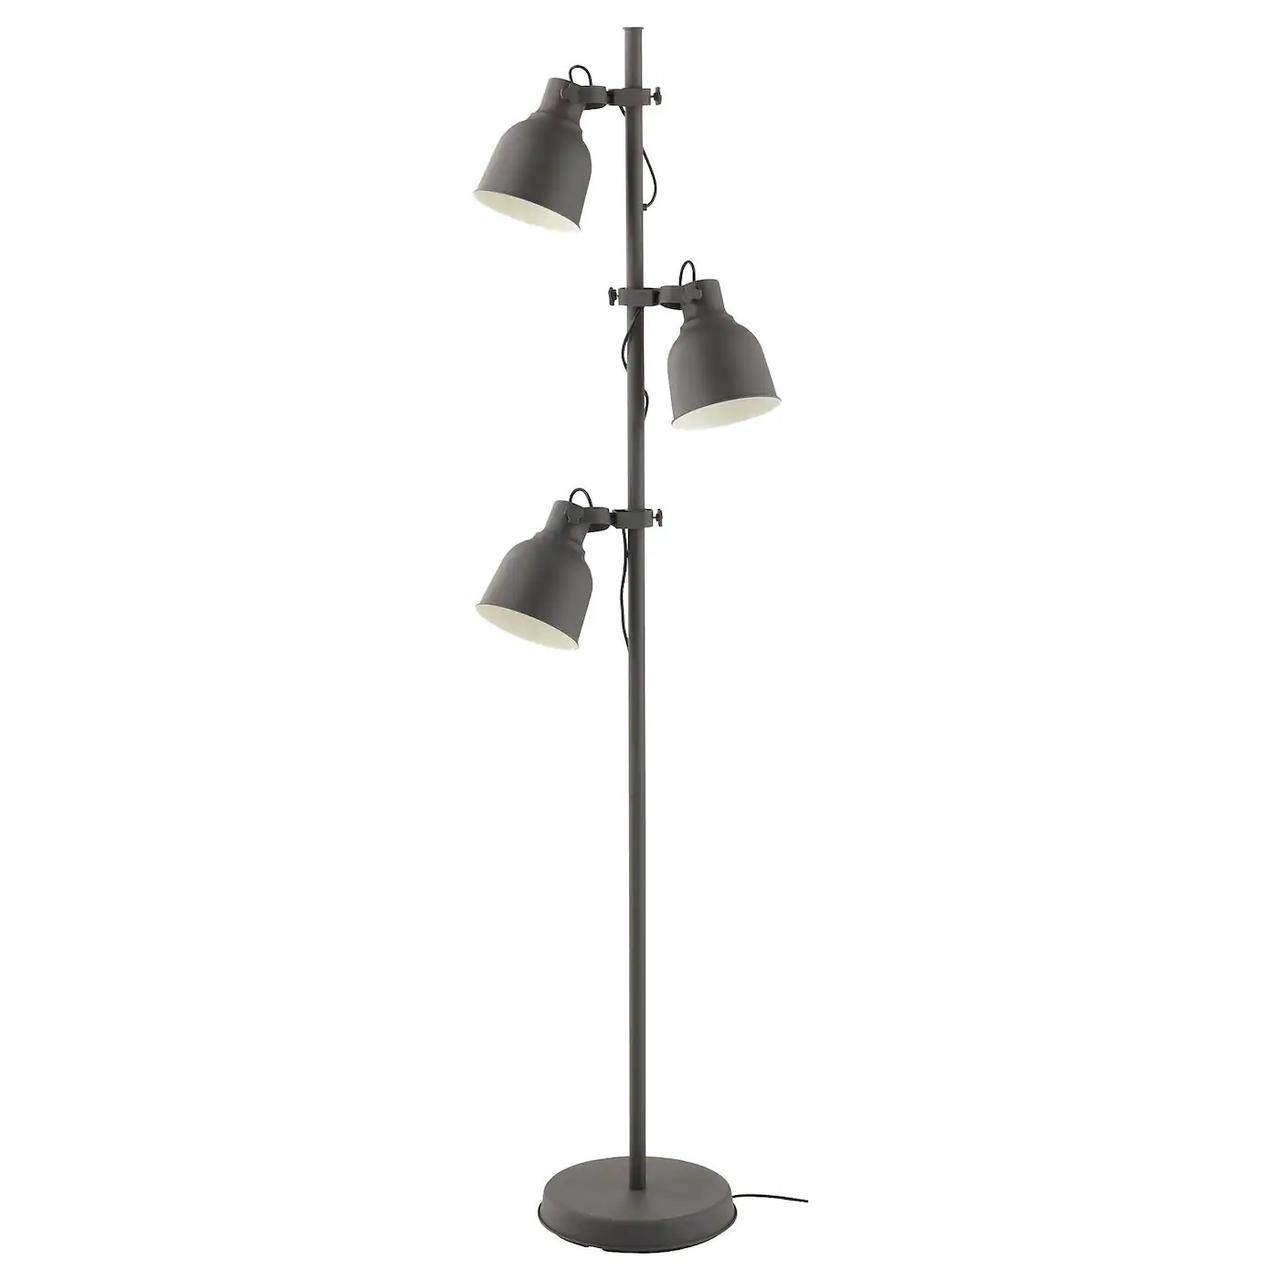 Напольная лампа с 3 прожекторами HEKTAR